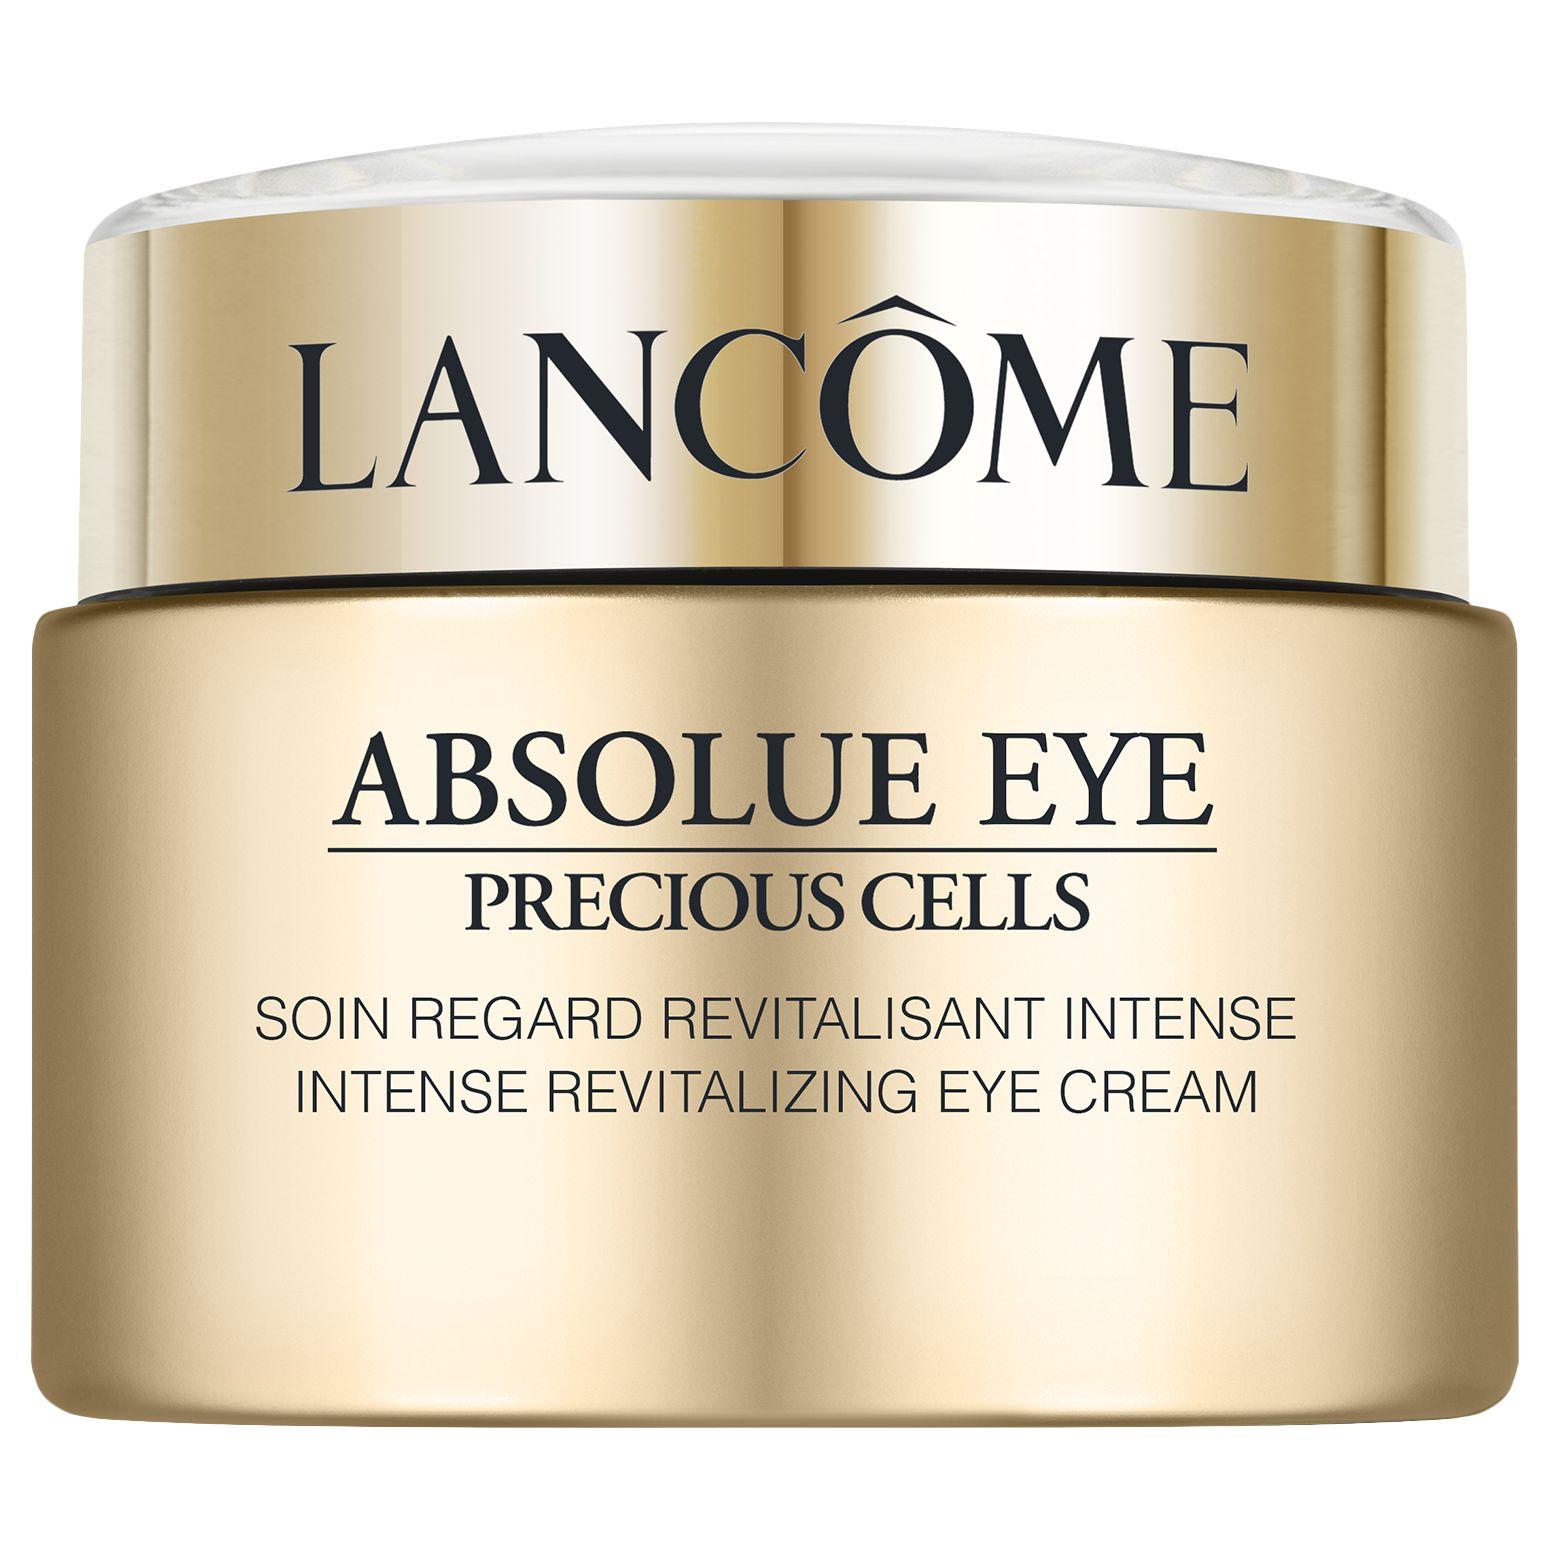 LANCÔME ABSOLUE EYE PRECIOUS CELLS Intense Revitalising Eye Cream 20ml